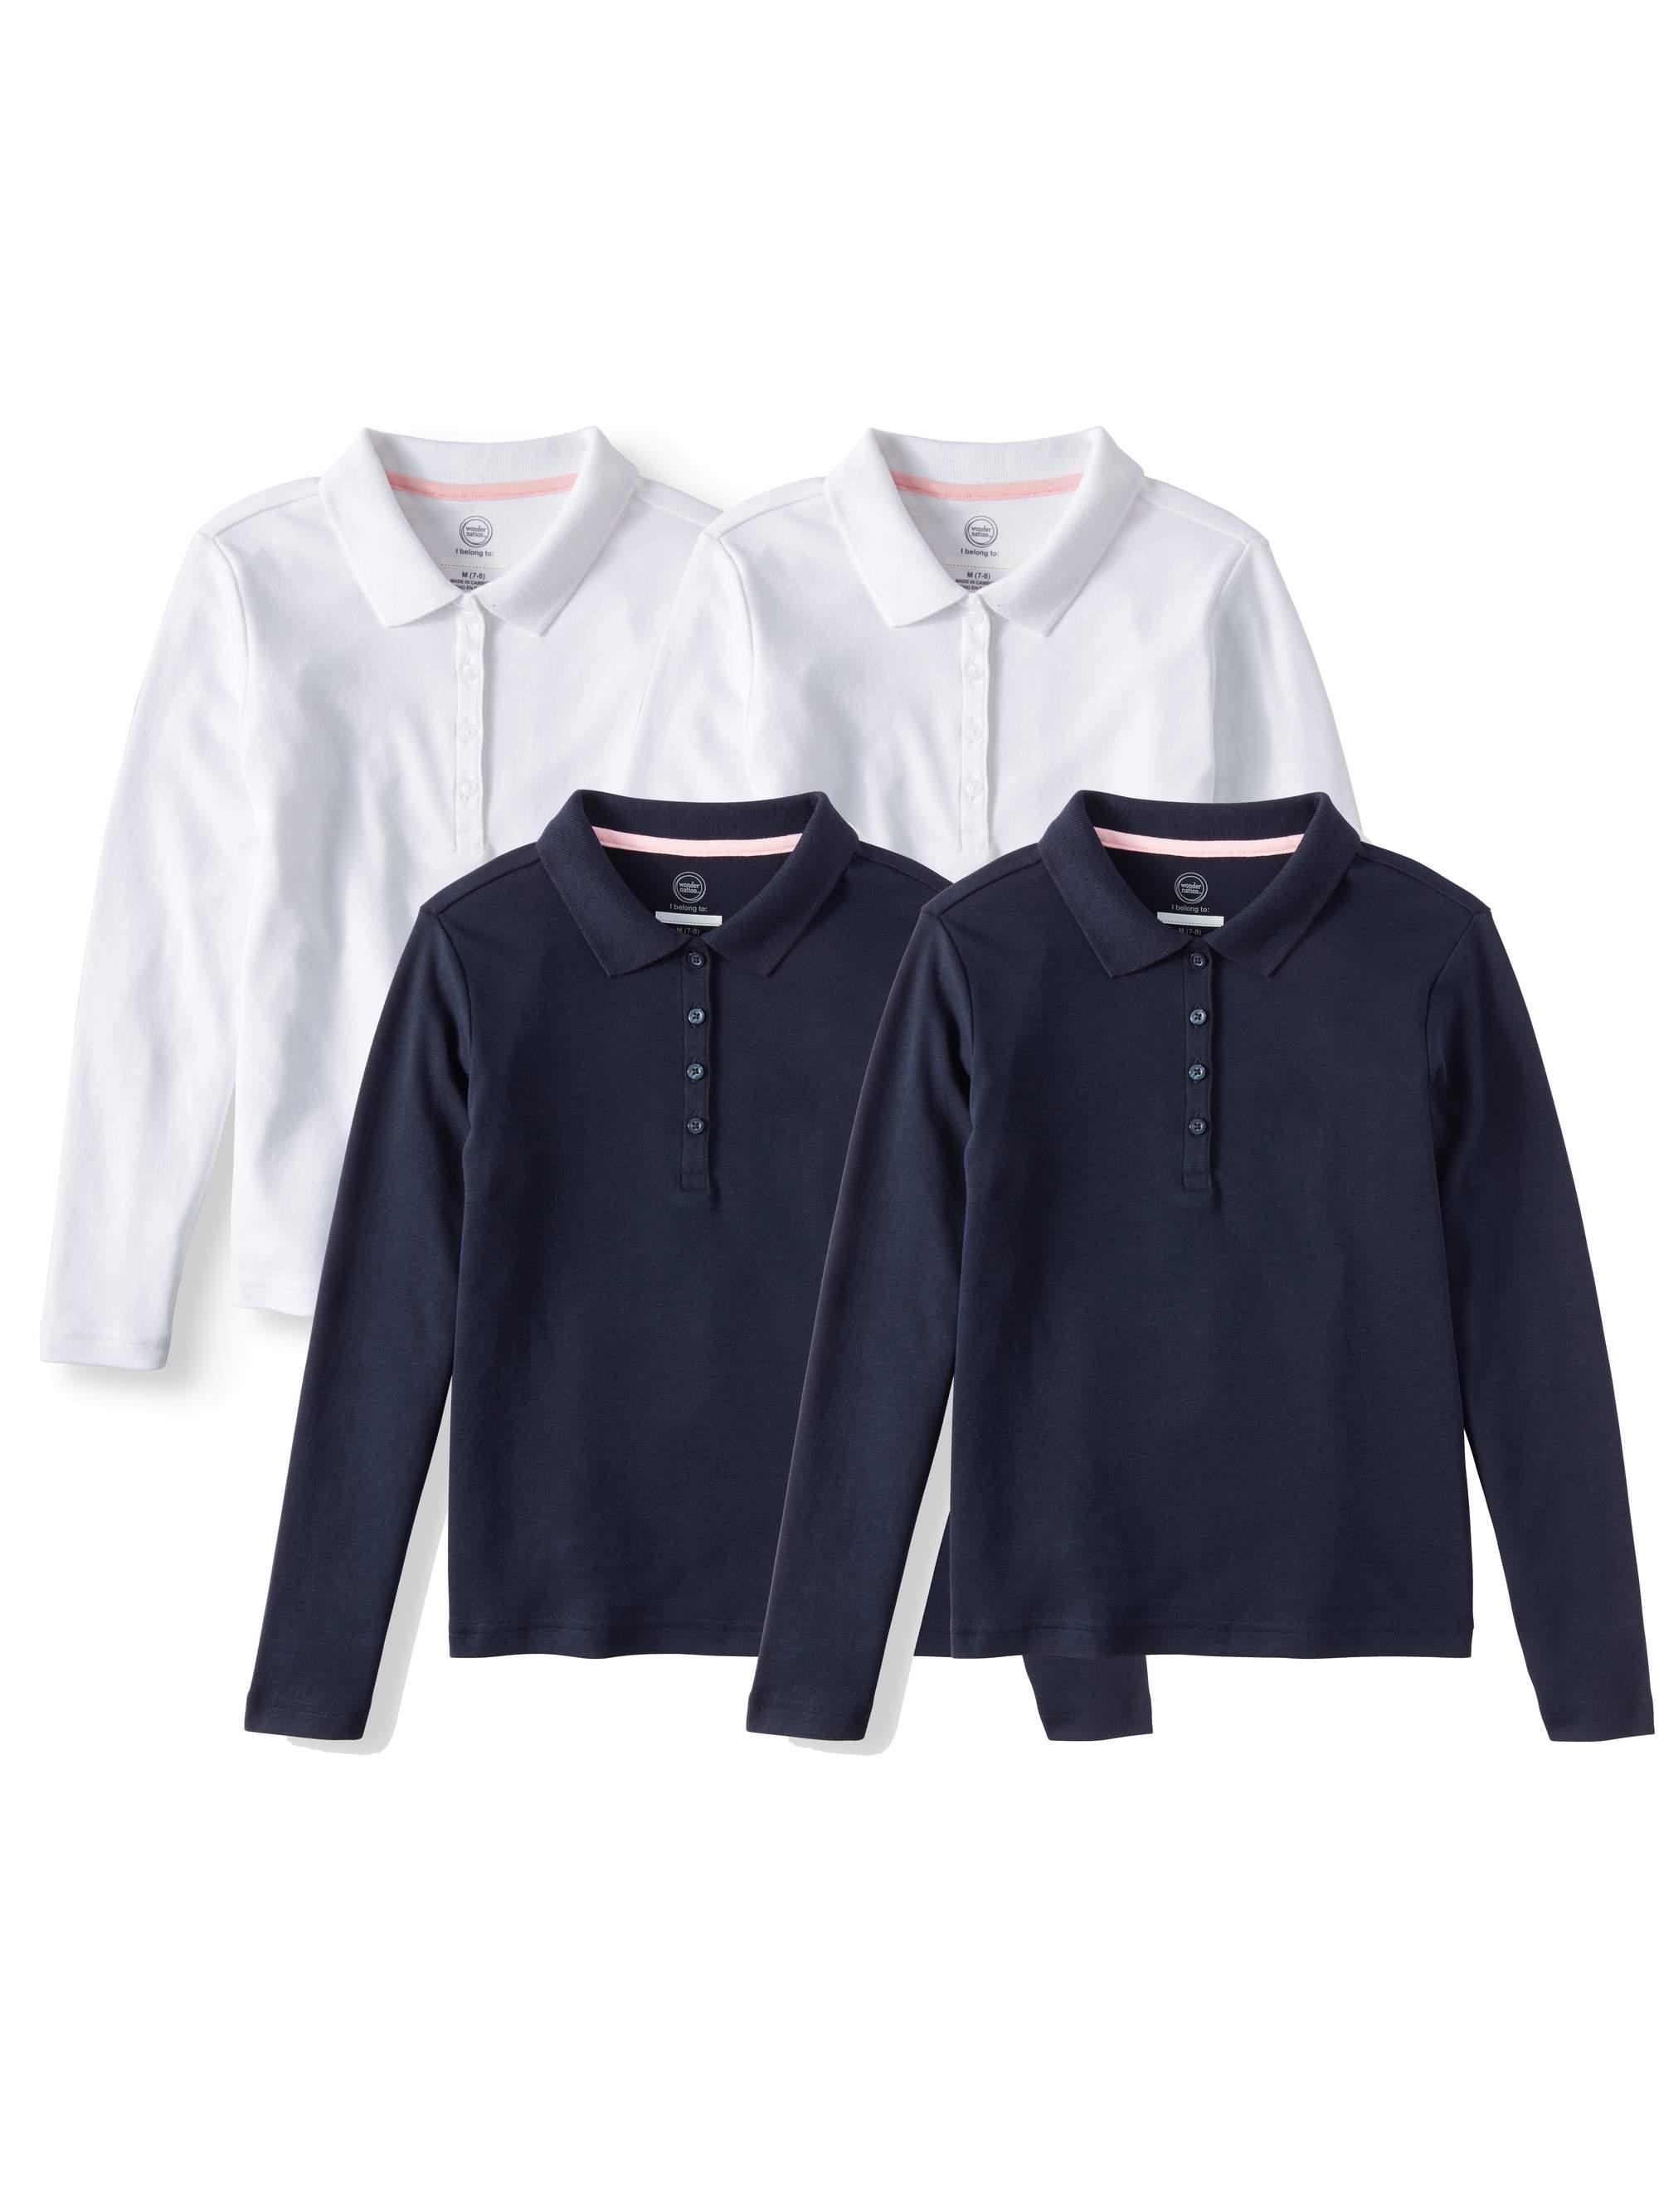 Girls School Uniform Long Sleeve Interlock Polo, 4-Pack Value Bundle